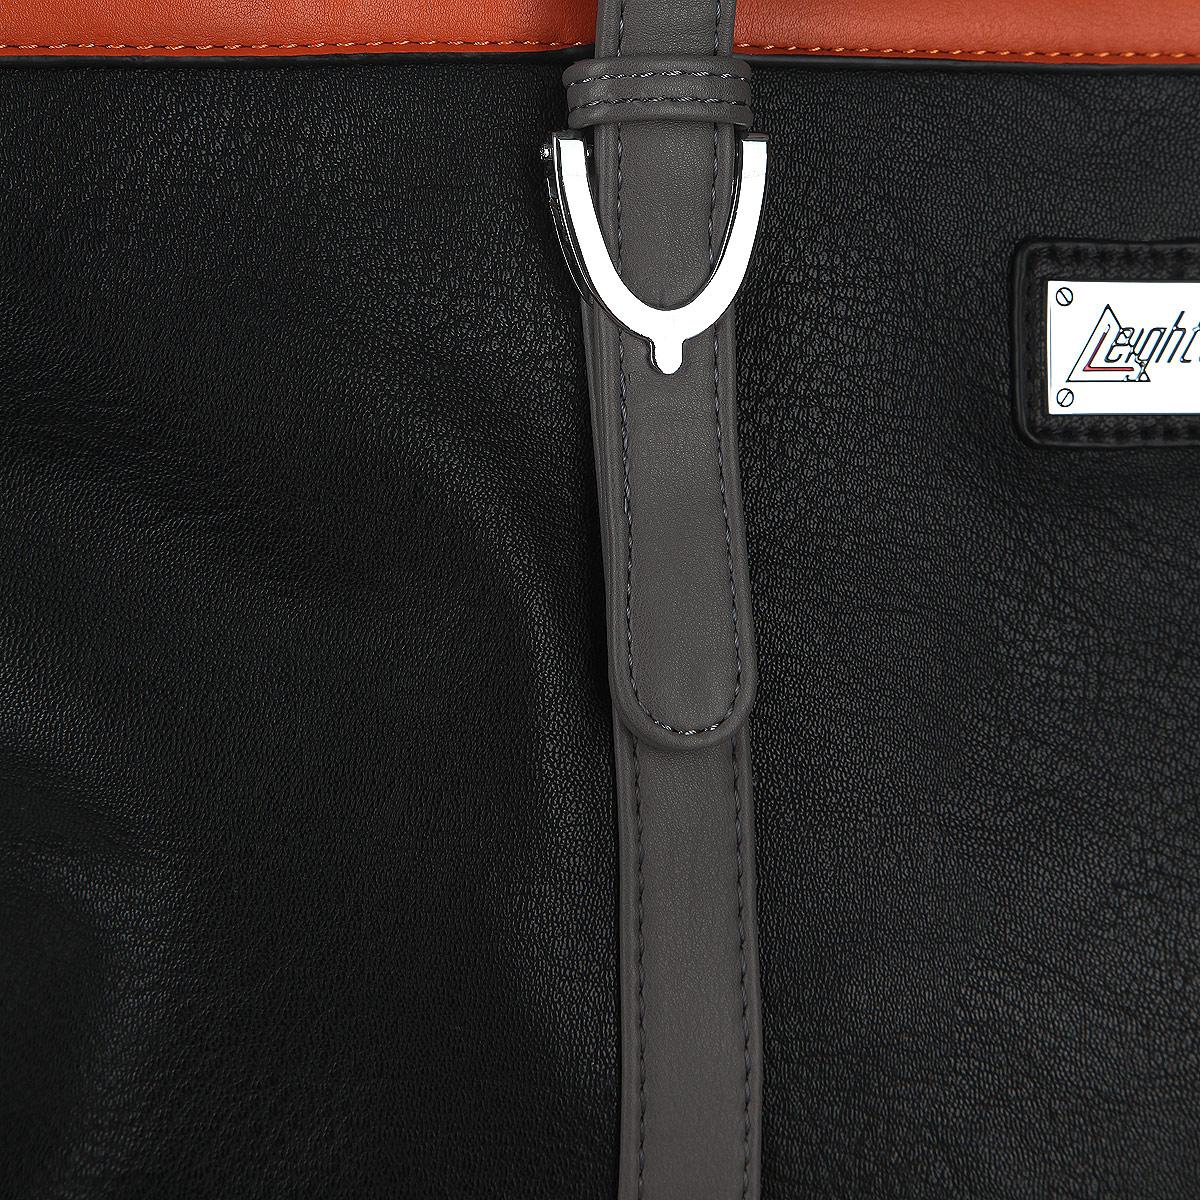 Сумка женская Leighton, цвет: черный, серый, оранжевый. 570493-3822/1/1166/931/11 ( 570493-3822/1/1166/931/11 )